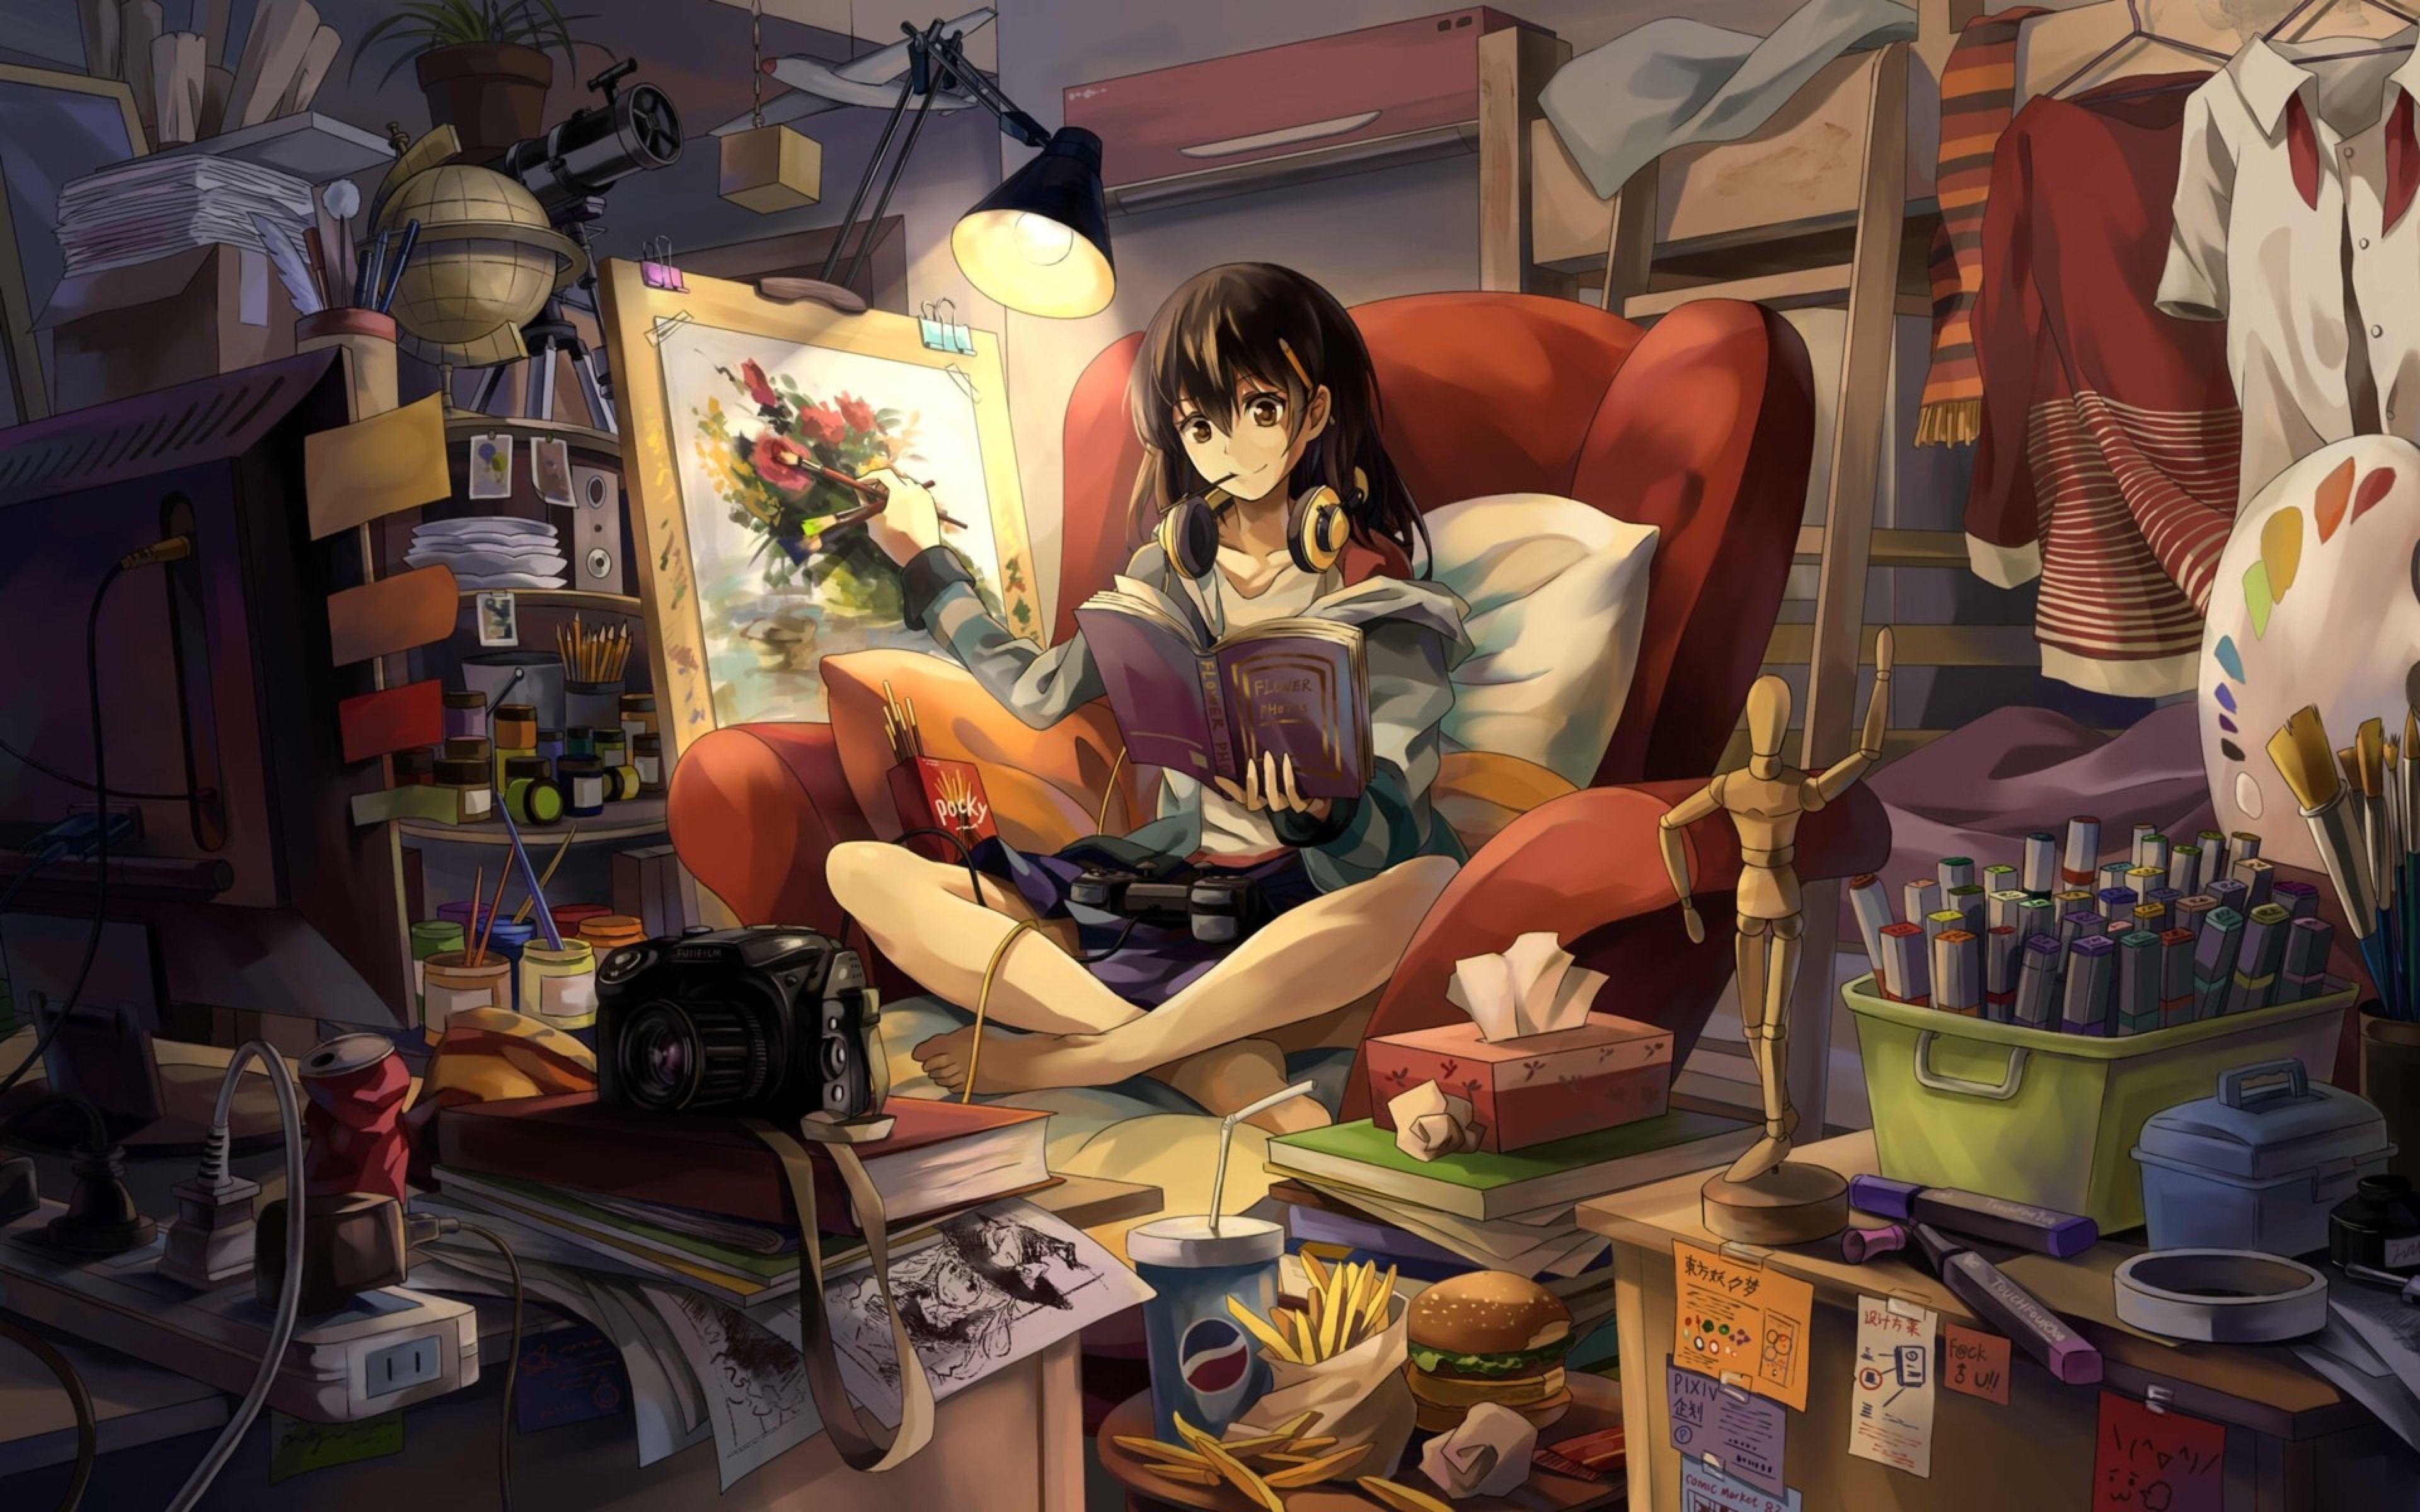 3840x2400 Wallpaper Neko Yanshoujie Room Girl Graphic Hand Headphones Easel Shape Books Food Camera L Anime Tapete Madchen Gemalde Anime Landschaft